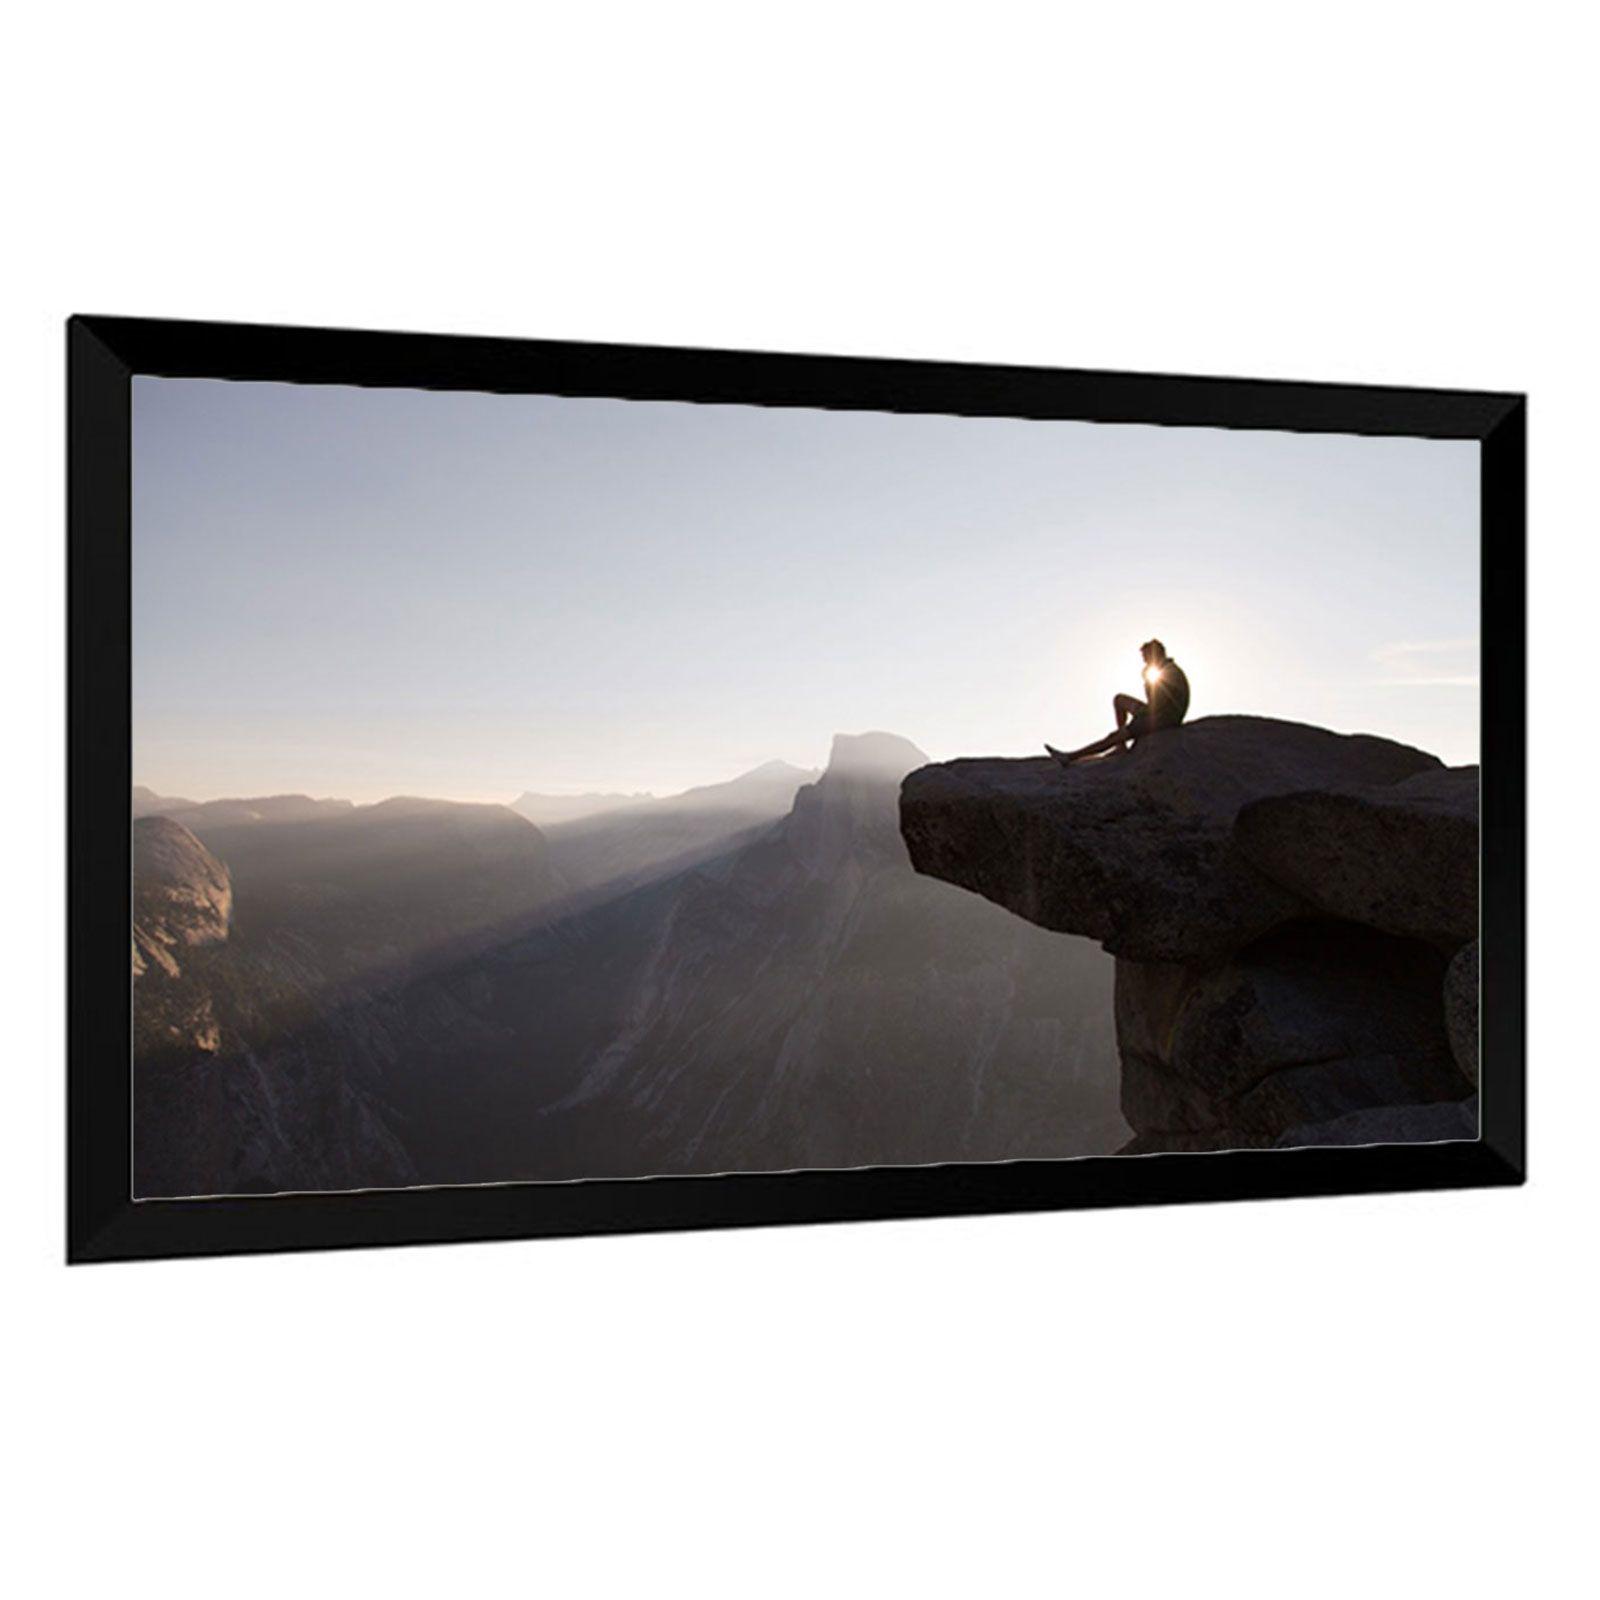 Carl\'s Fixed Frame Projector Screen Kits include: Heavy-Duty ...